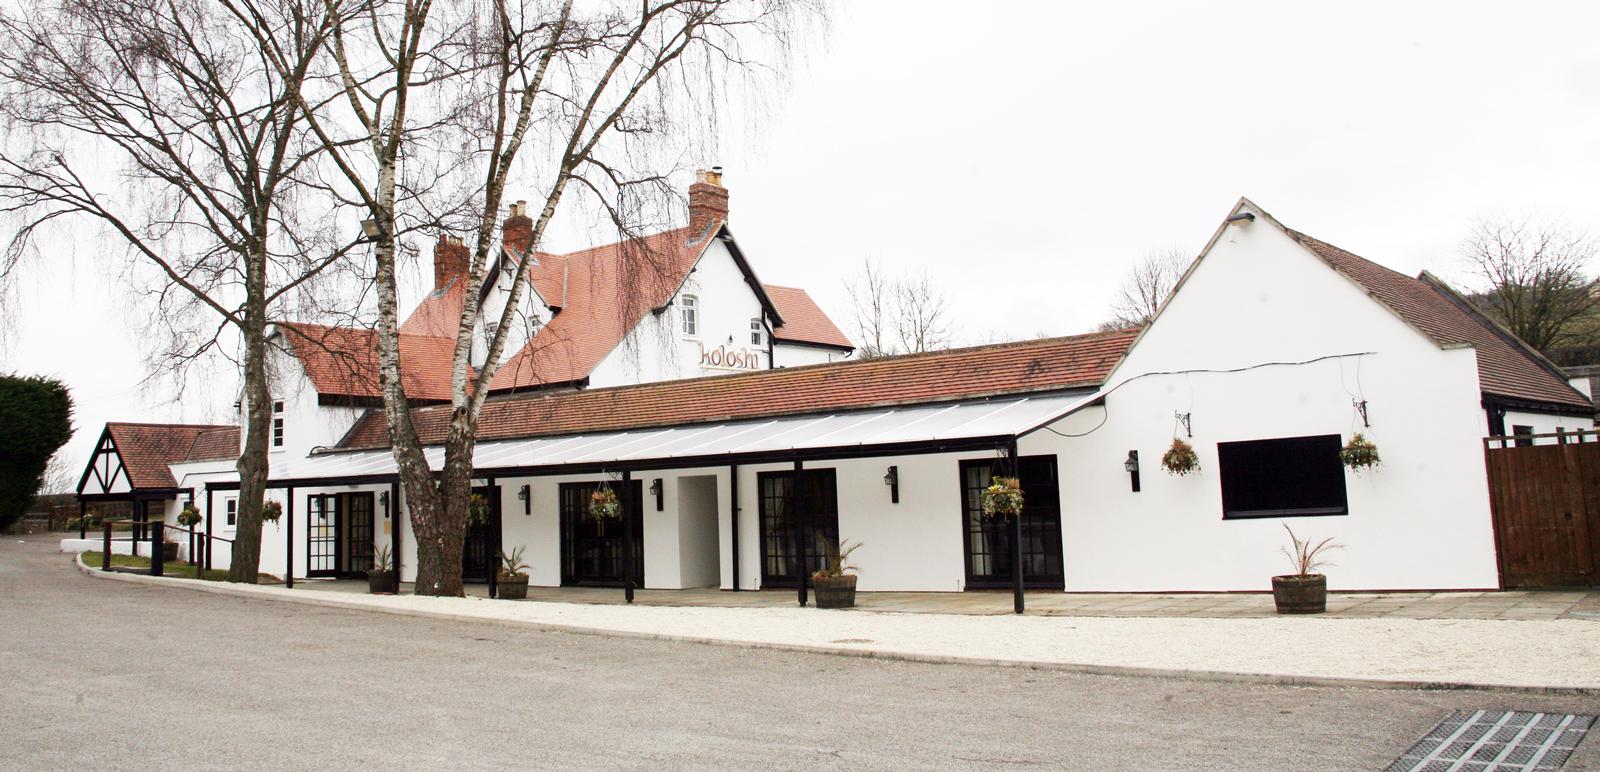 koloshi-indian-restaurant-cheltenham